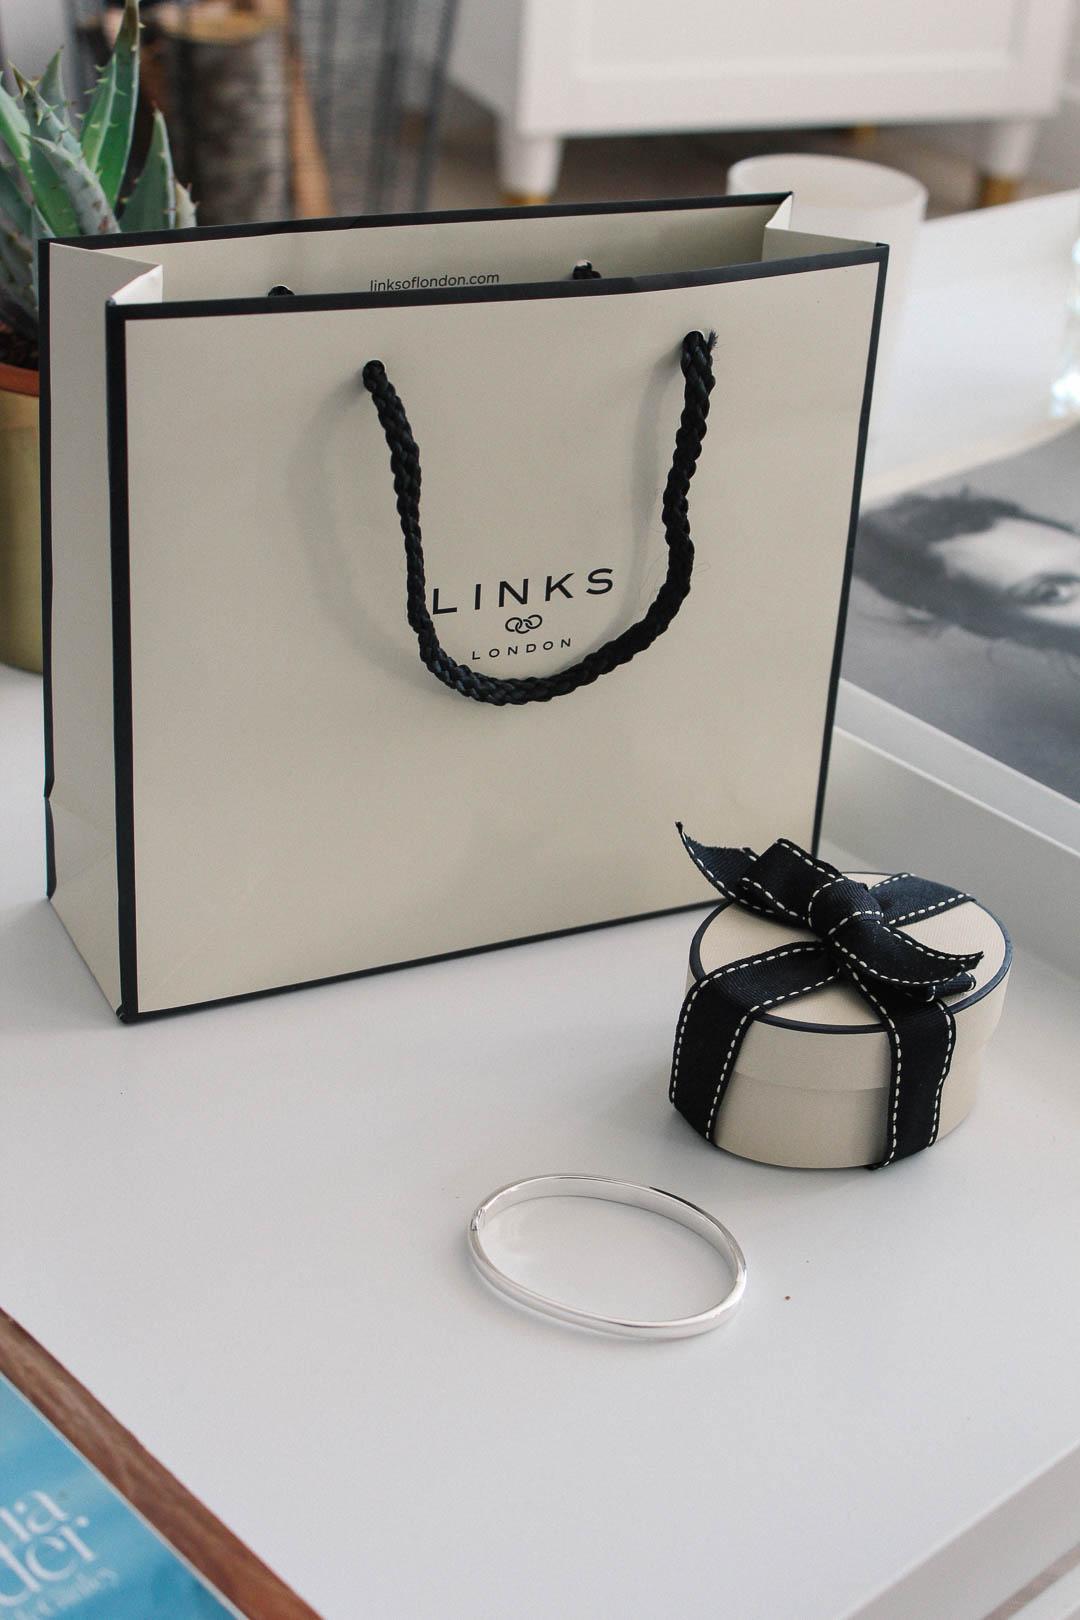 linksoflondon-100 (2 of 2)